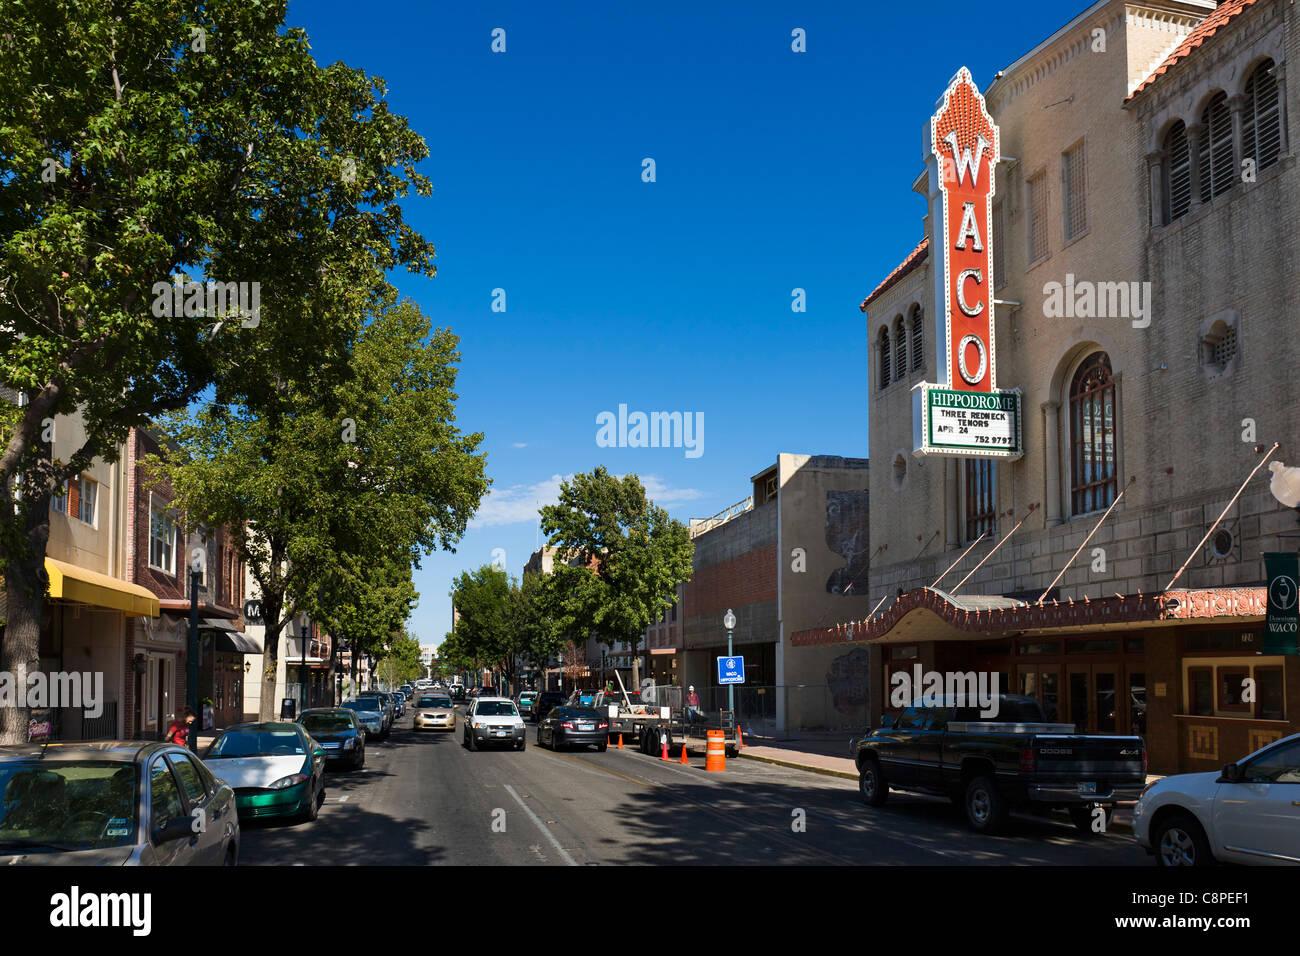 Austin Avenue in historic downtown Waco, Texas, USA - Stock Image